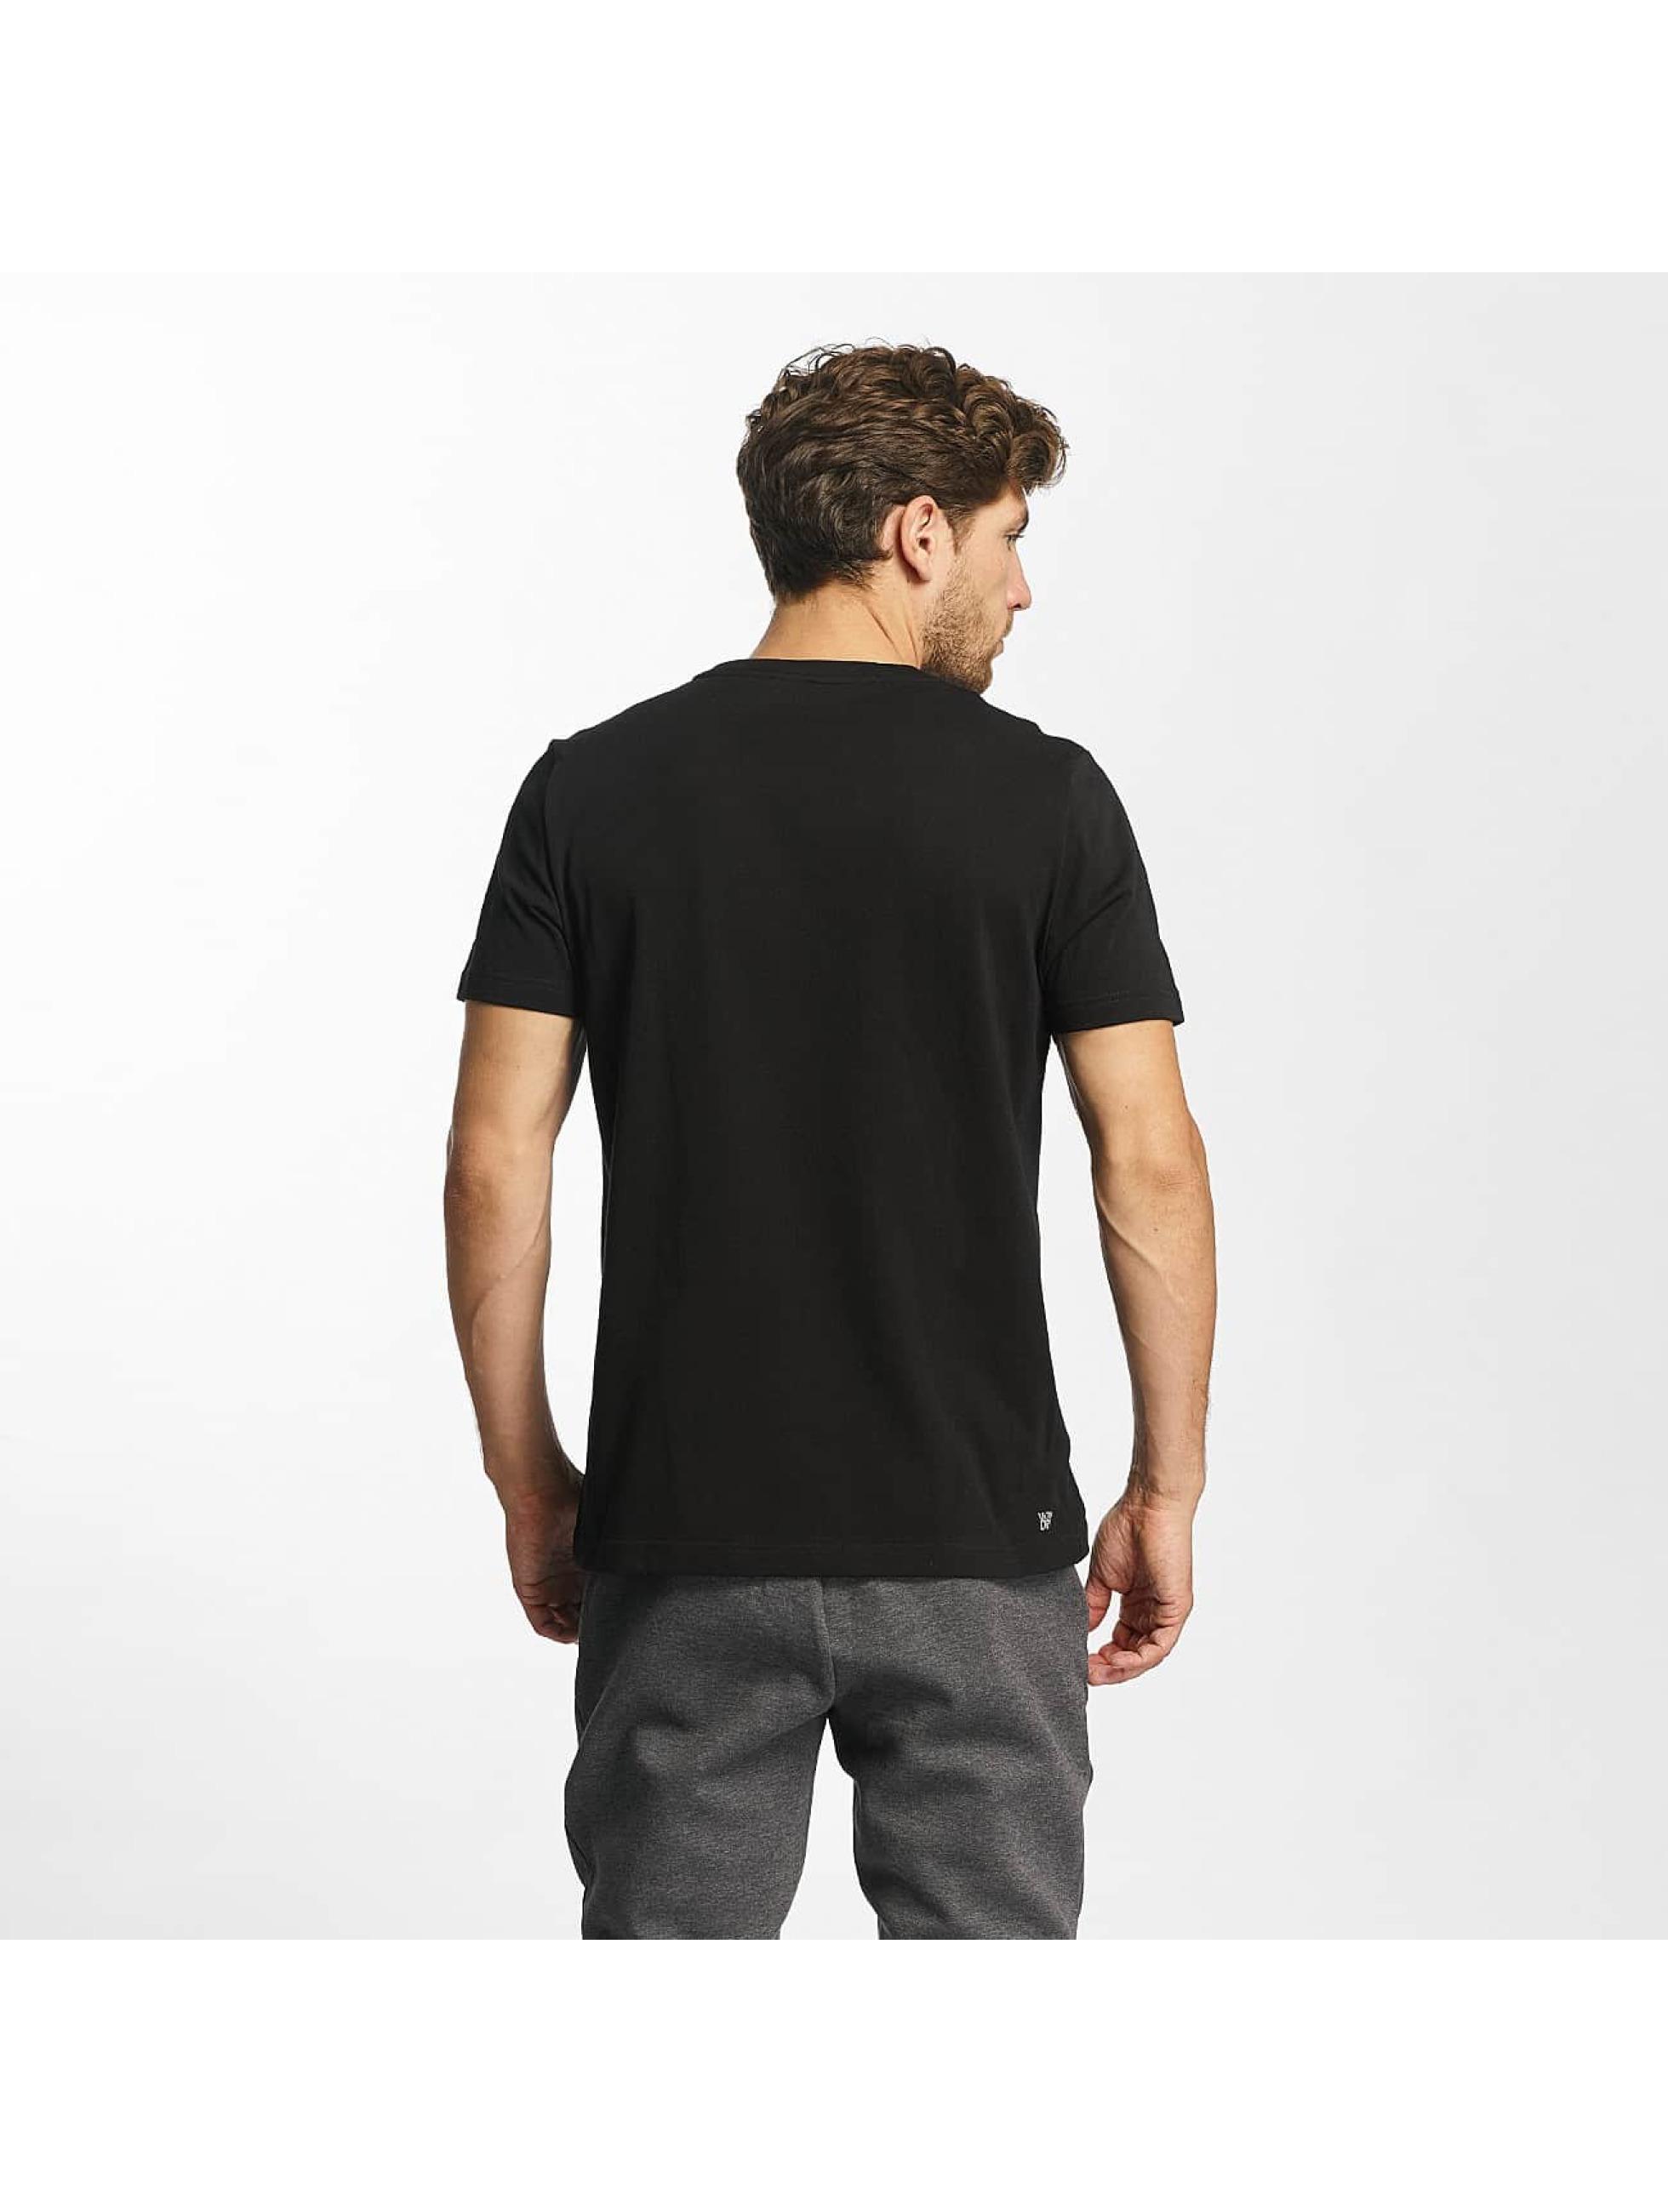 Lacoste Classic T-Shirt TH8134 black